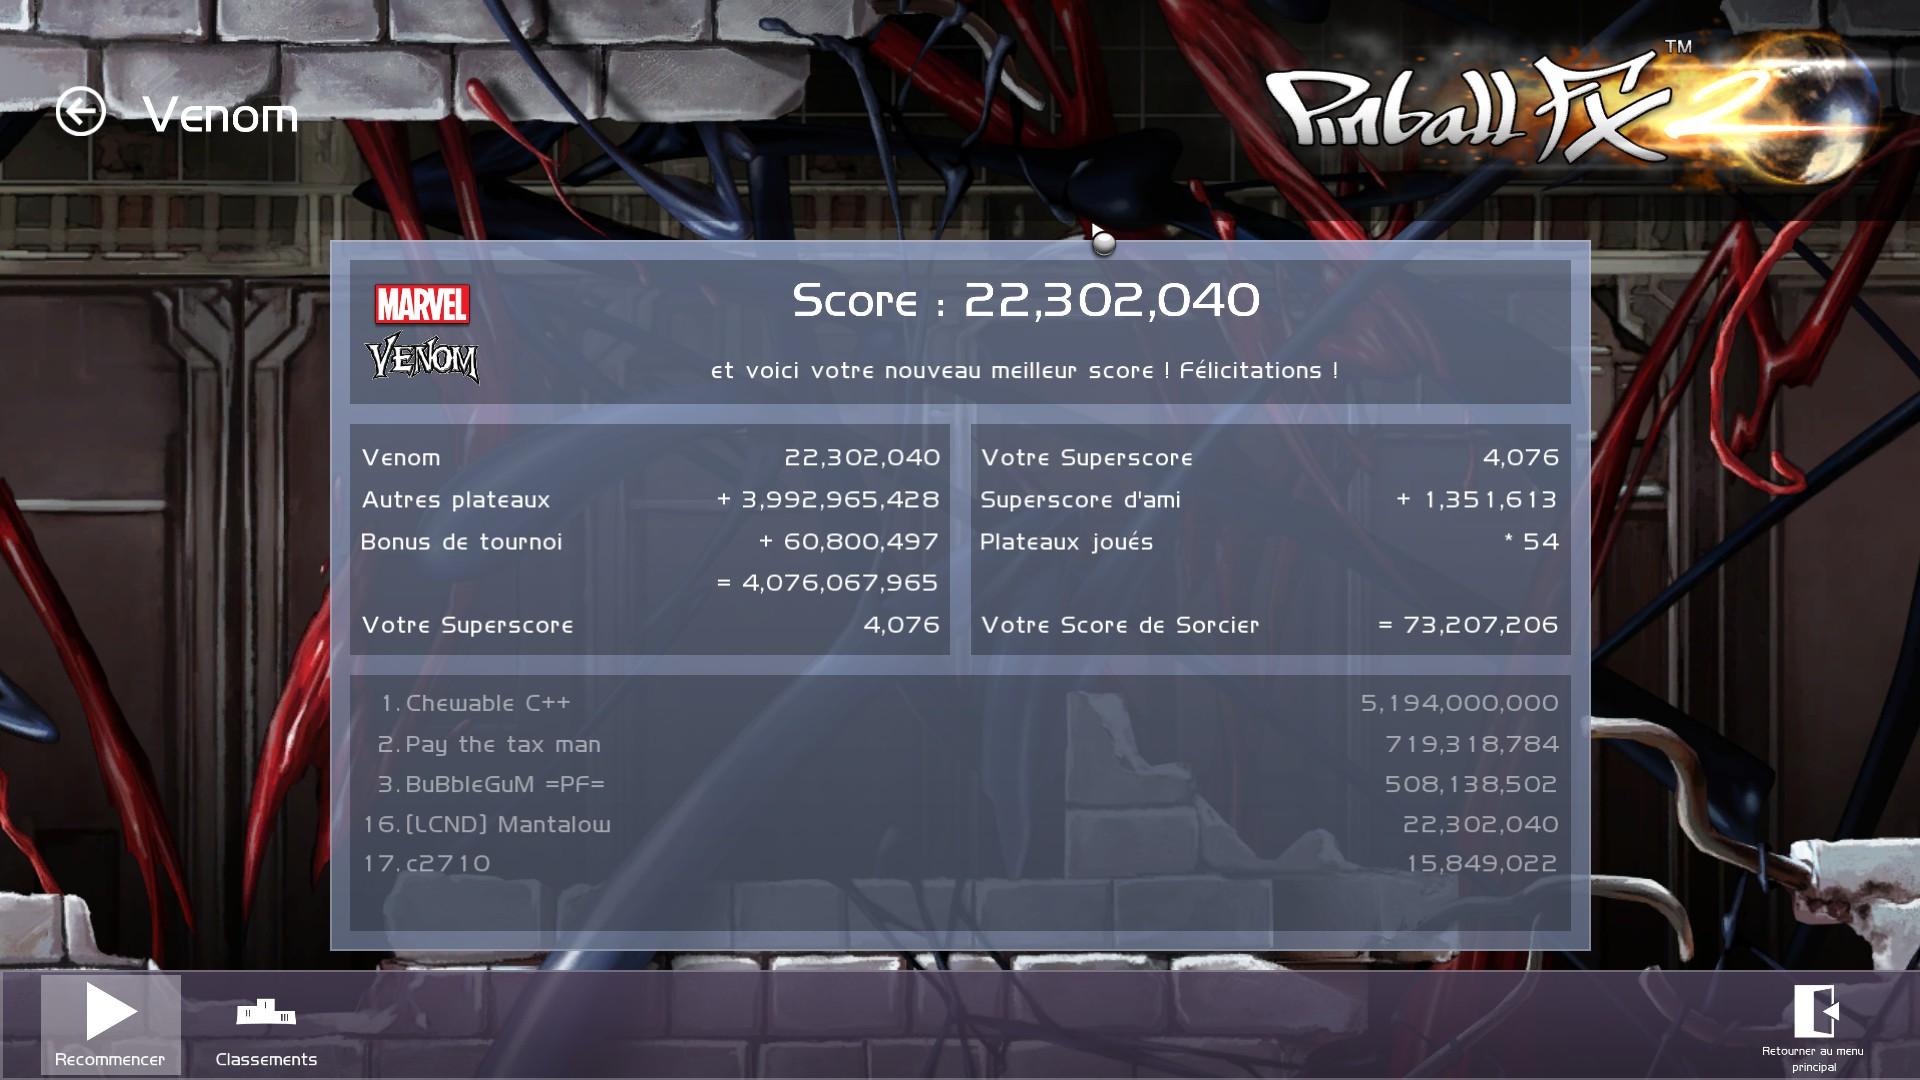 Mantalow: Pinball FX 2: Marvel: Venom (PC) 22,302,040 points on 2015-07-17 16:01:12